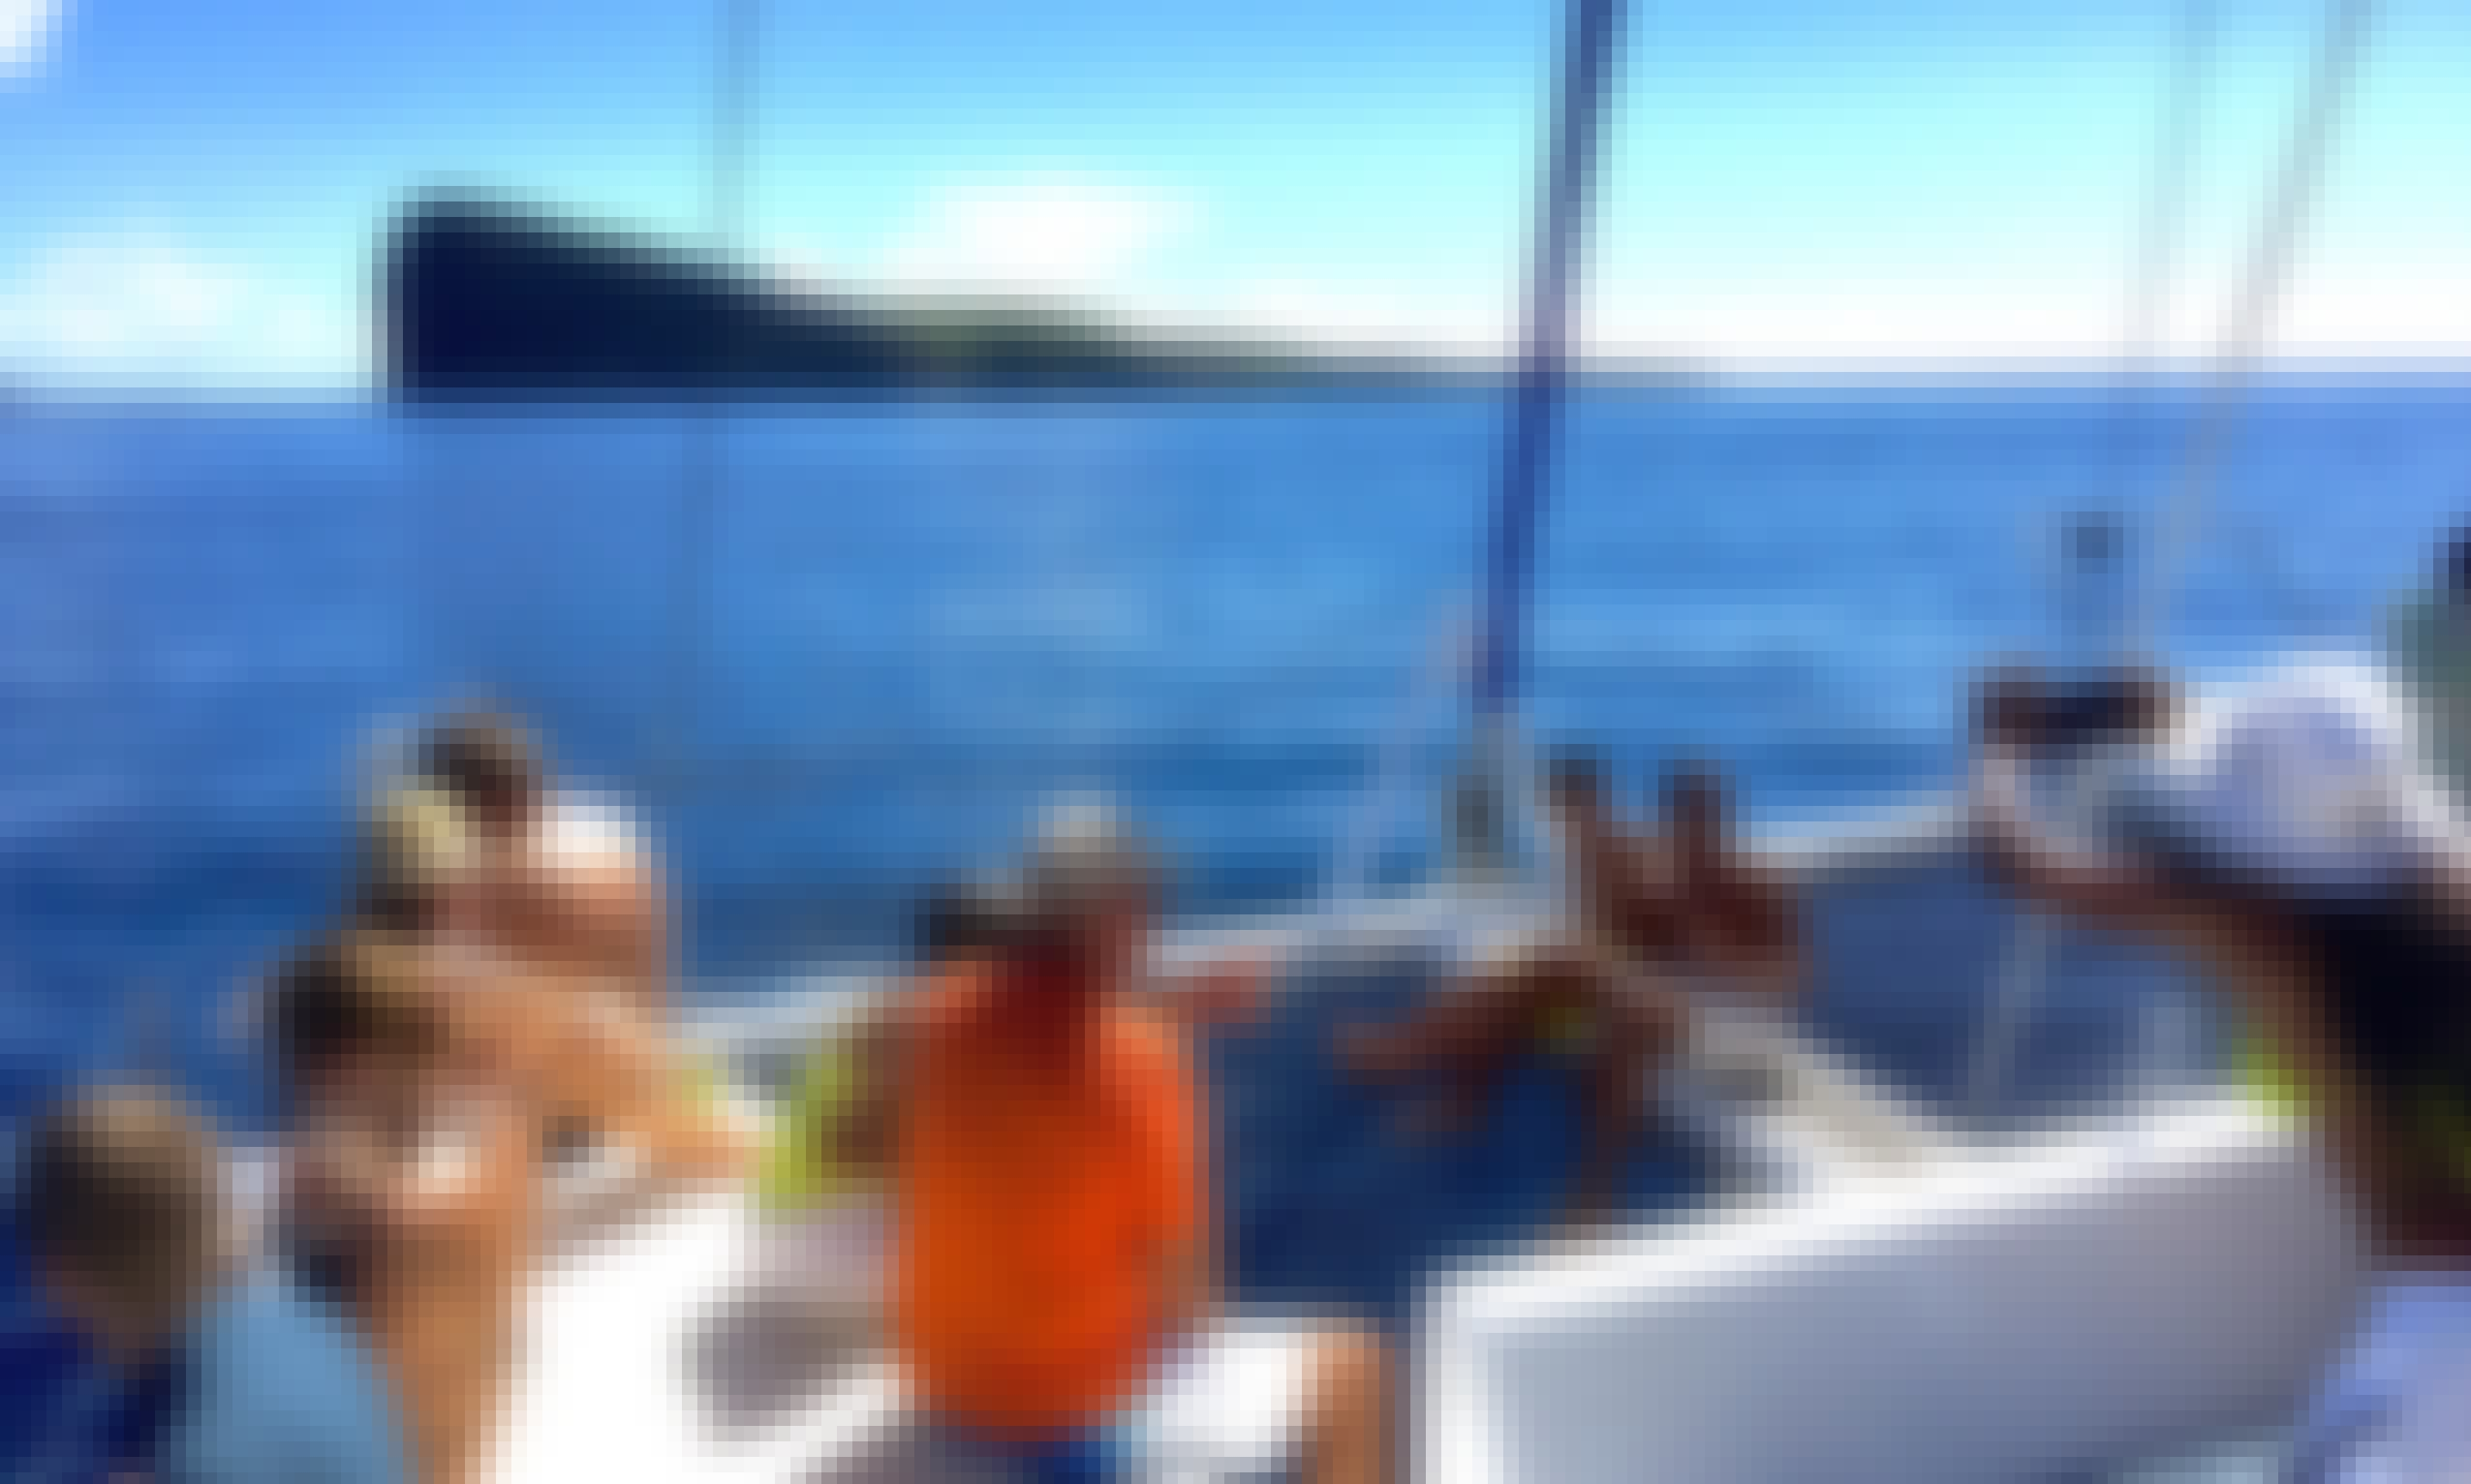 Full Day Catamaran Cruise to the Northern Islands